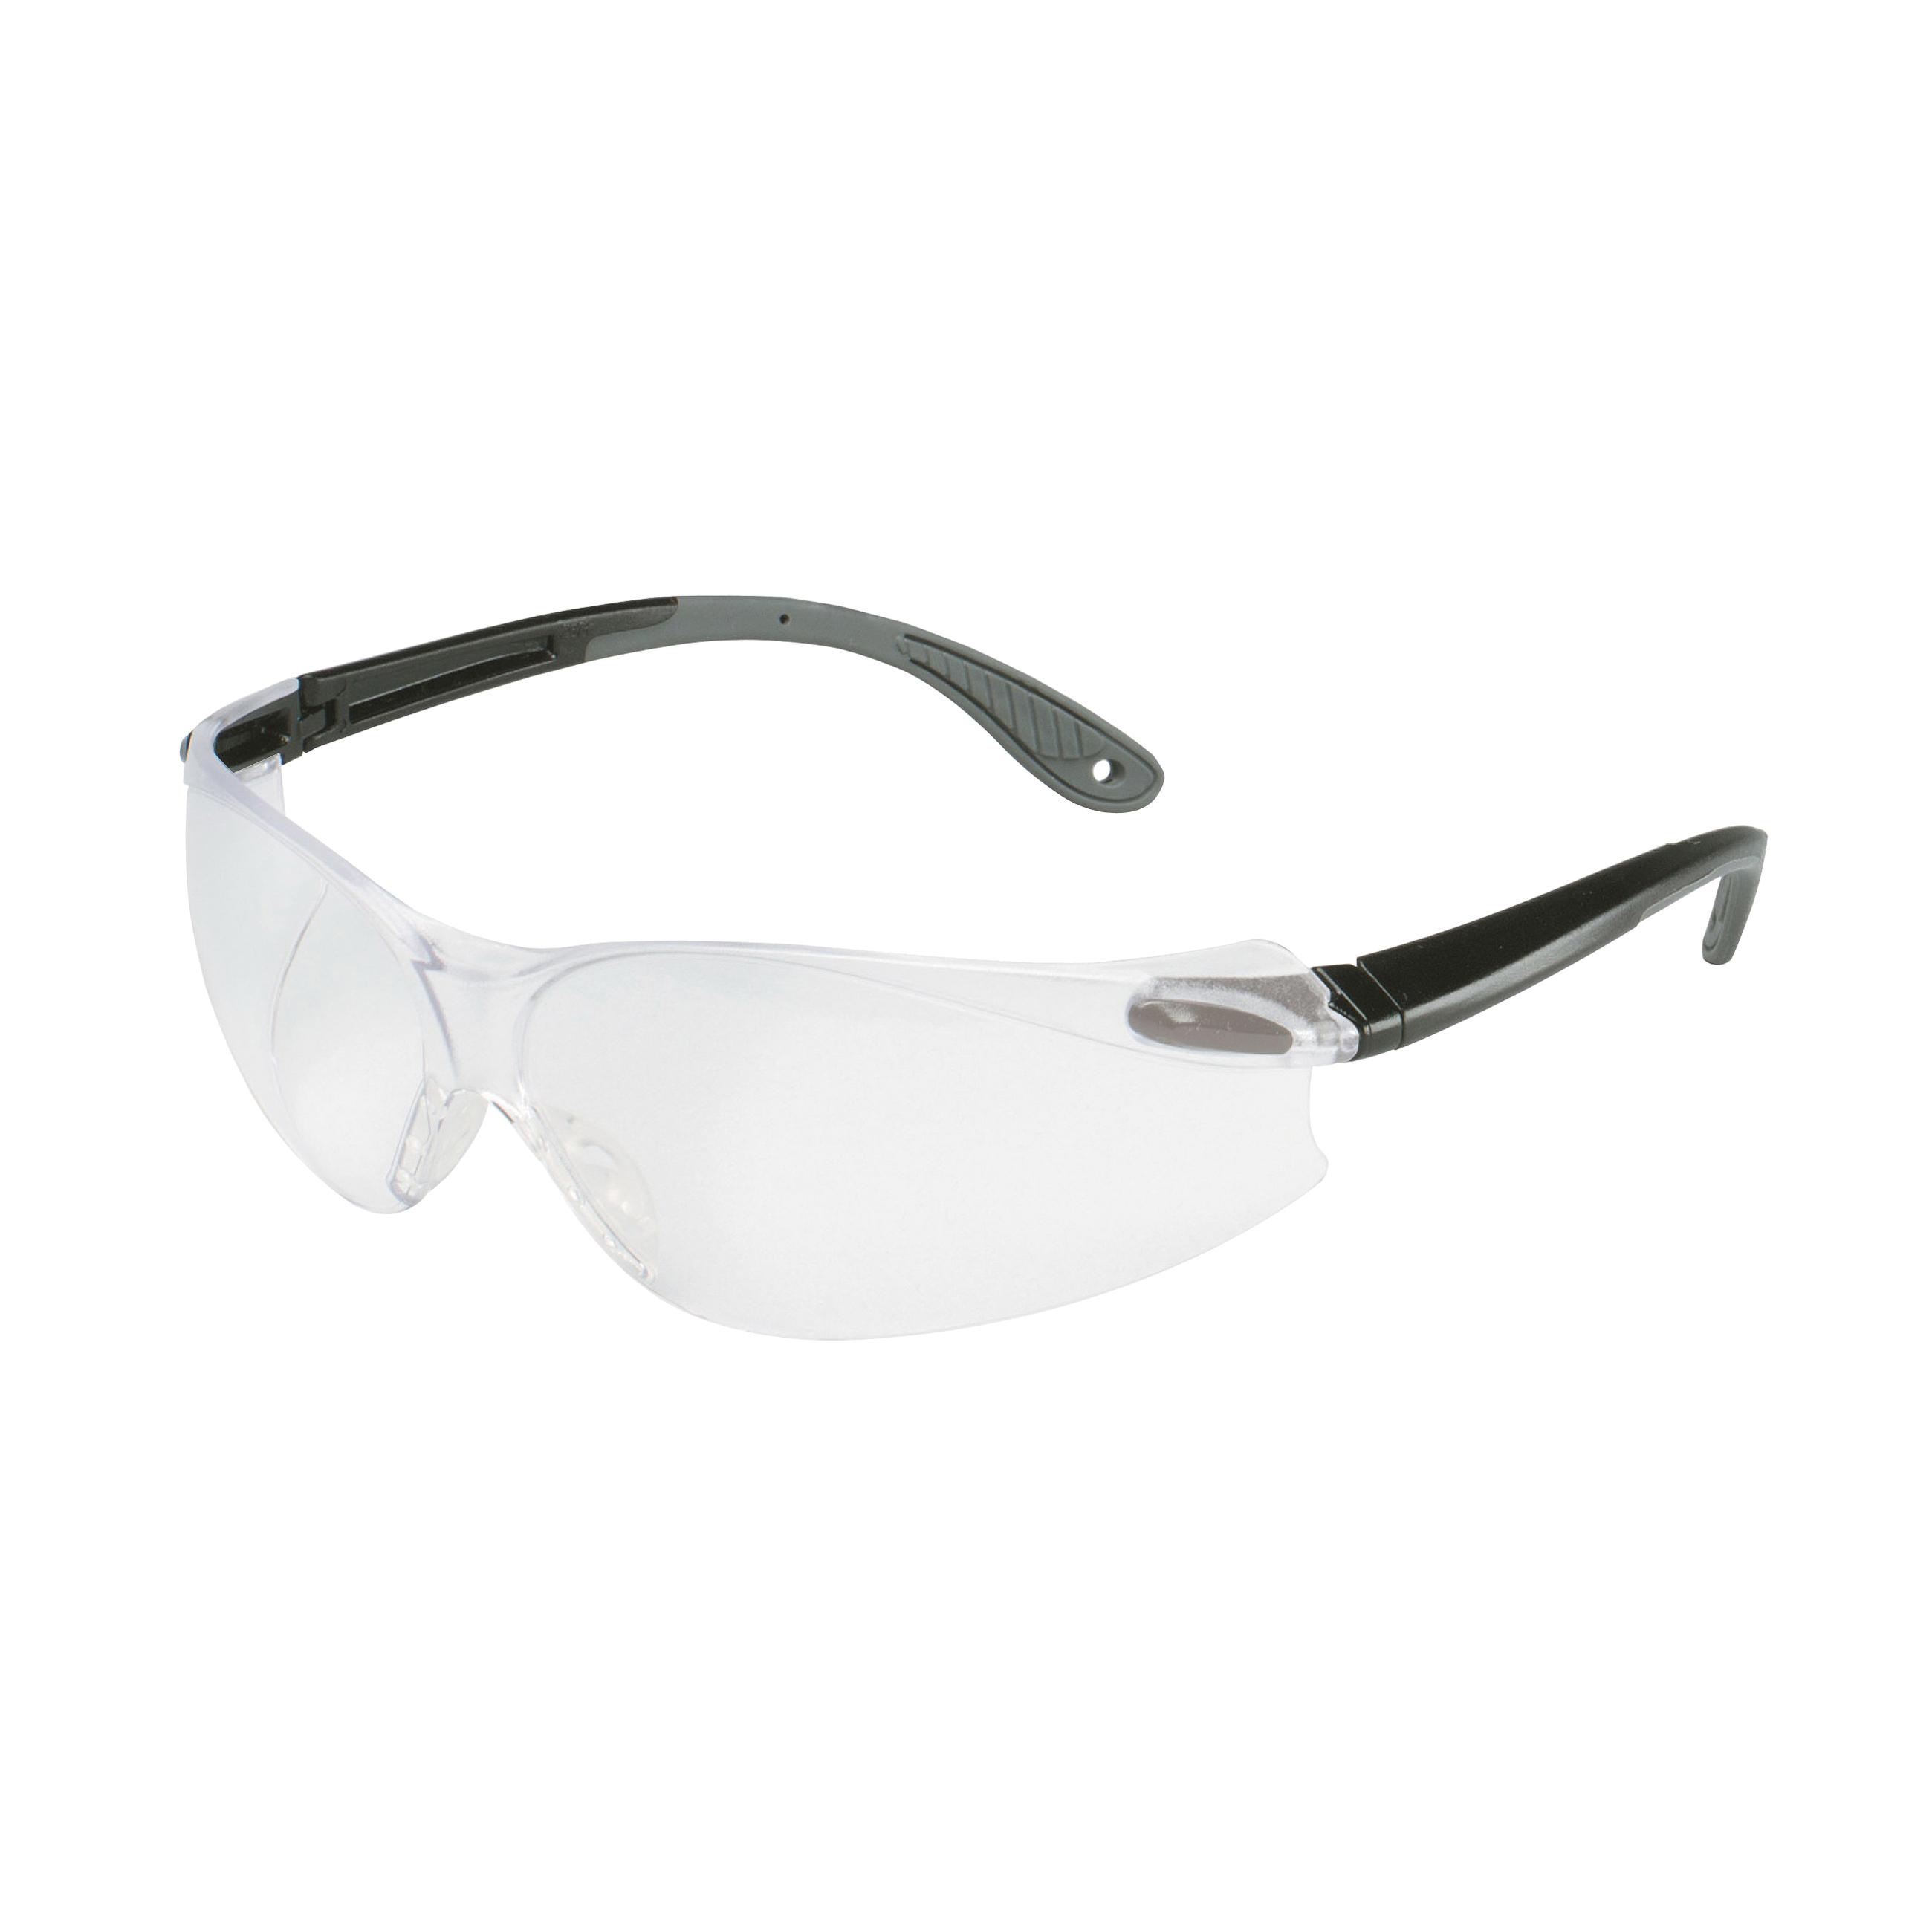 3M™ Virtua™ 078371-62036 11672-00000-20 V4 Economy Protective Eyewear, Anti-Fog Clear Lens, Frameless/Wraparound Black/Gray Polycarbonate Frame, Polycarbonate Lens, Specifications Met: ANSI Z87.1-2015